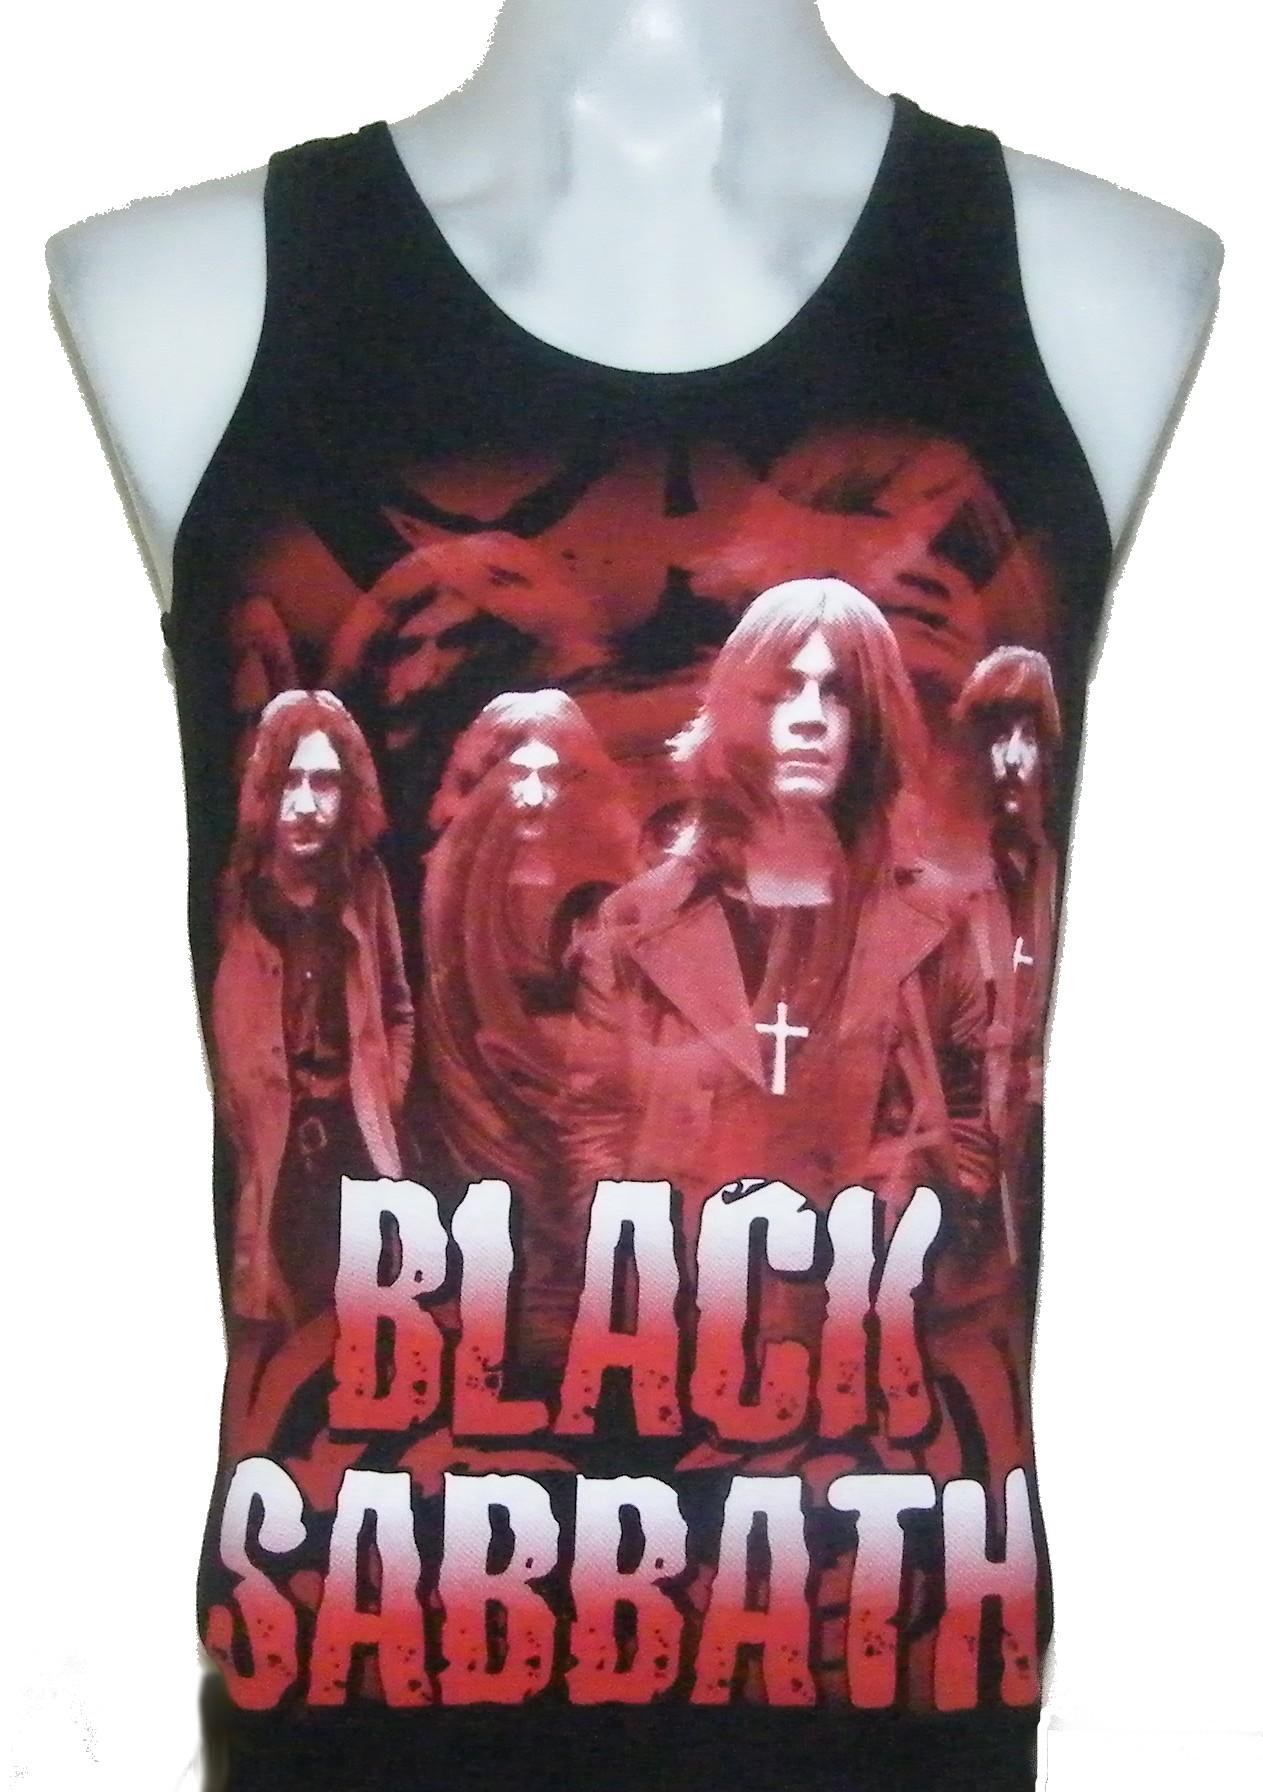 Top 50 Black Sabbath Songs. Author: LedFloydBeaTools. Including Ozzy Osbourne and Iommi solo.